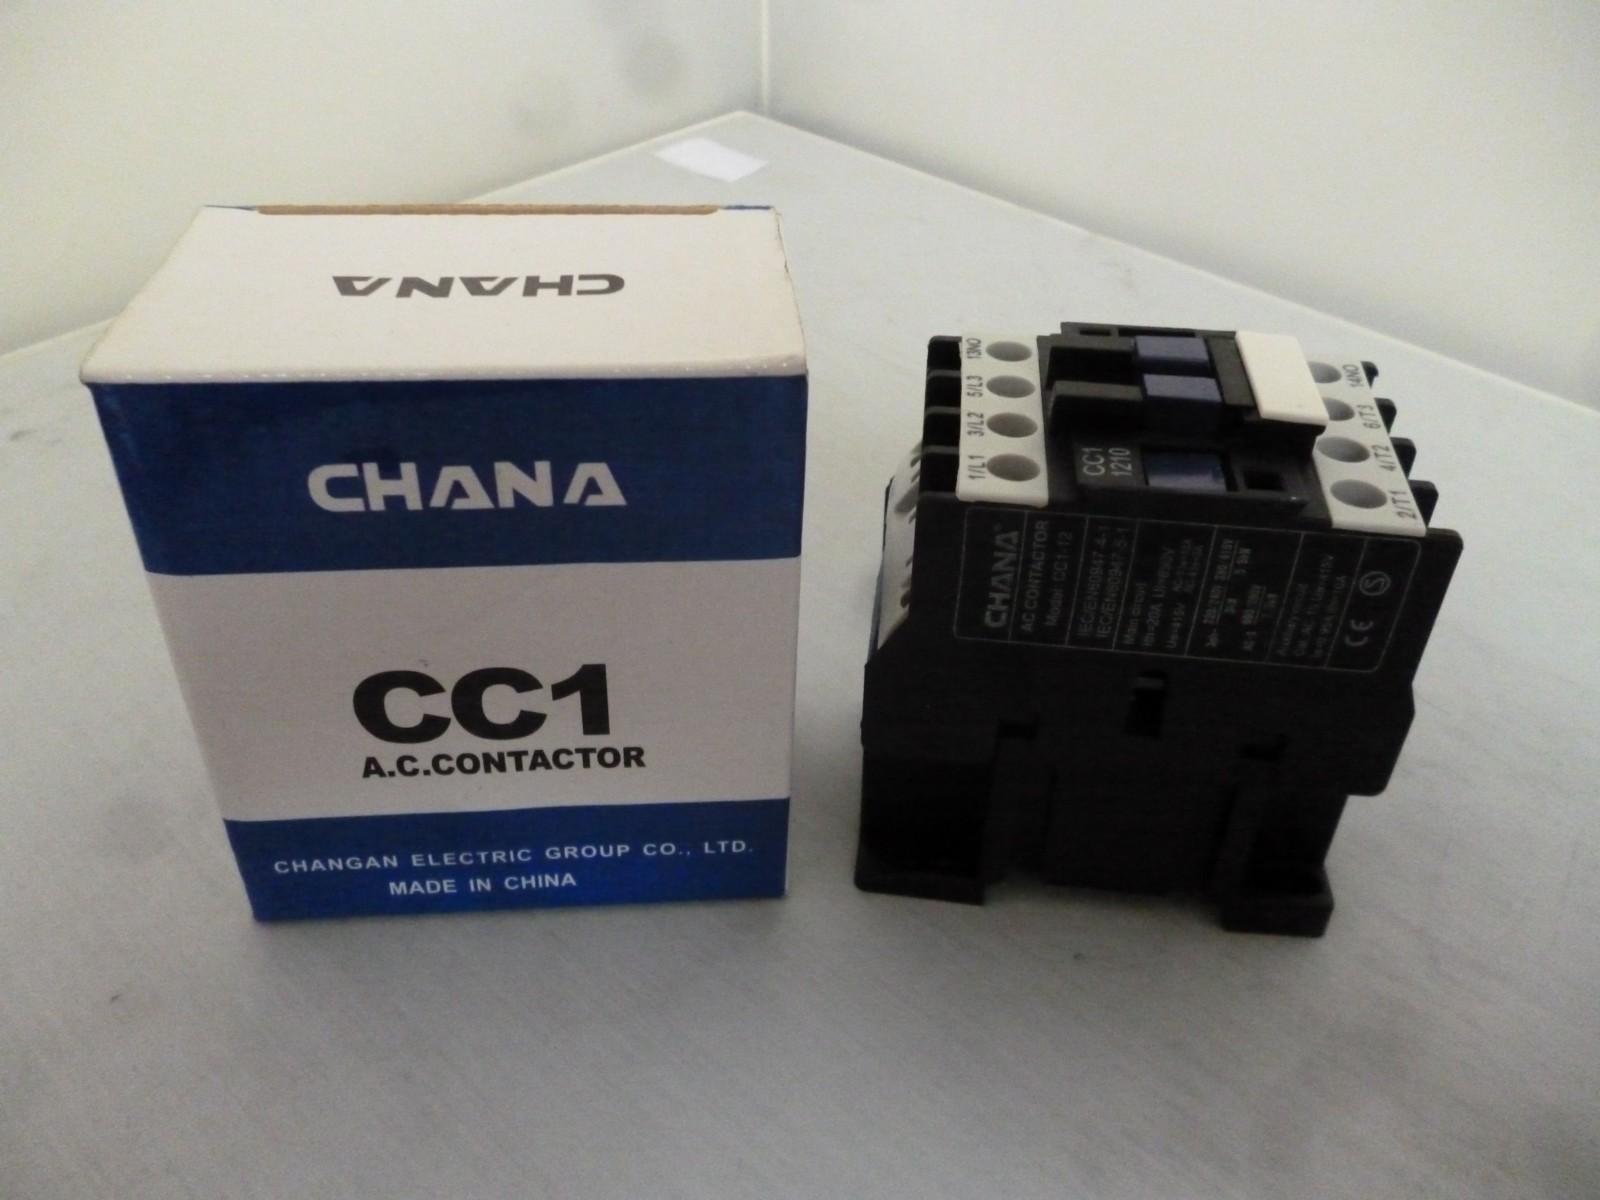 Chana CC1-1210 3 Pole Contactor